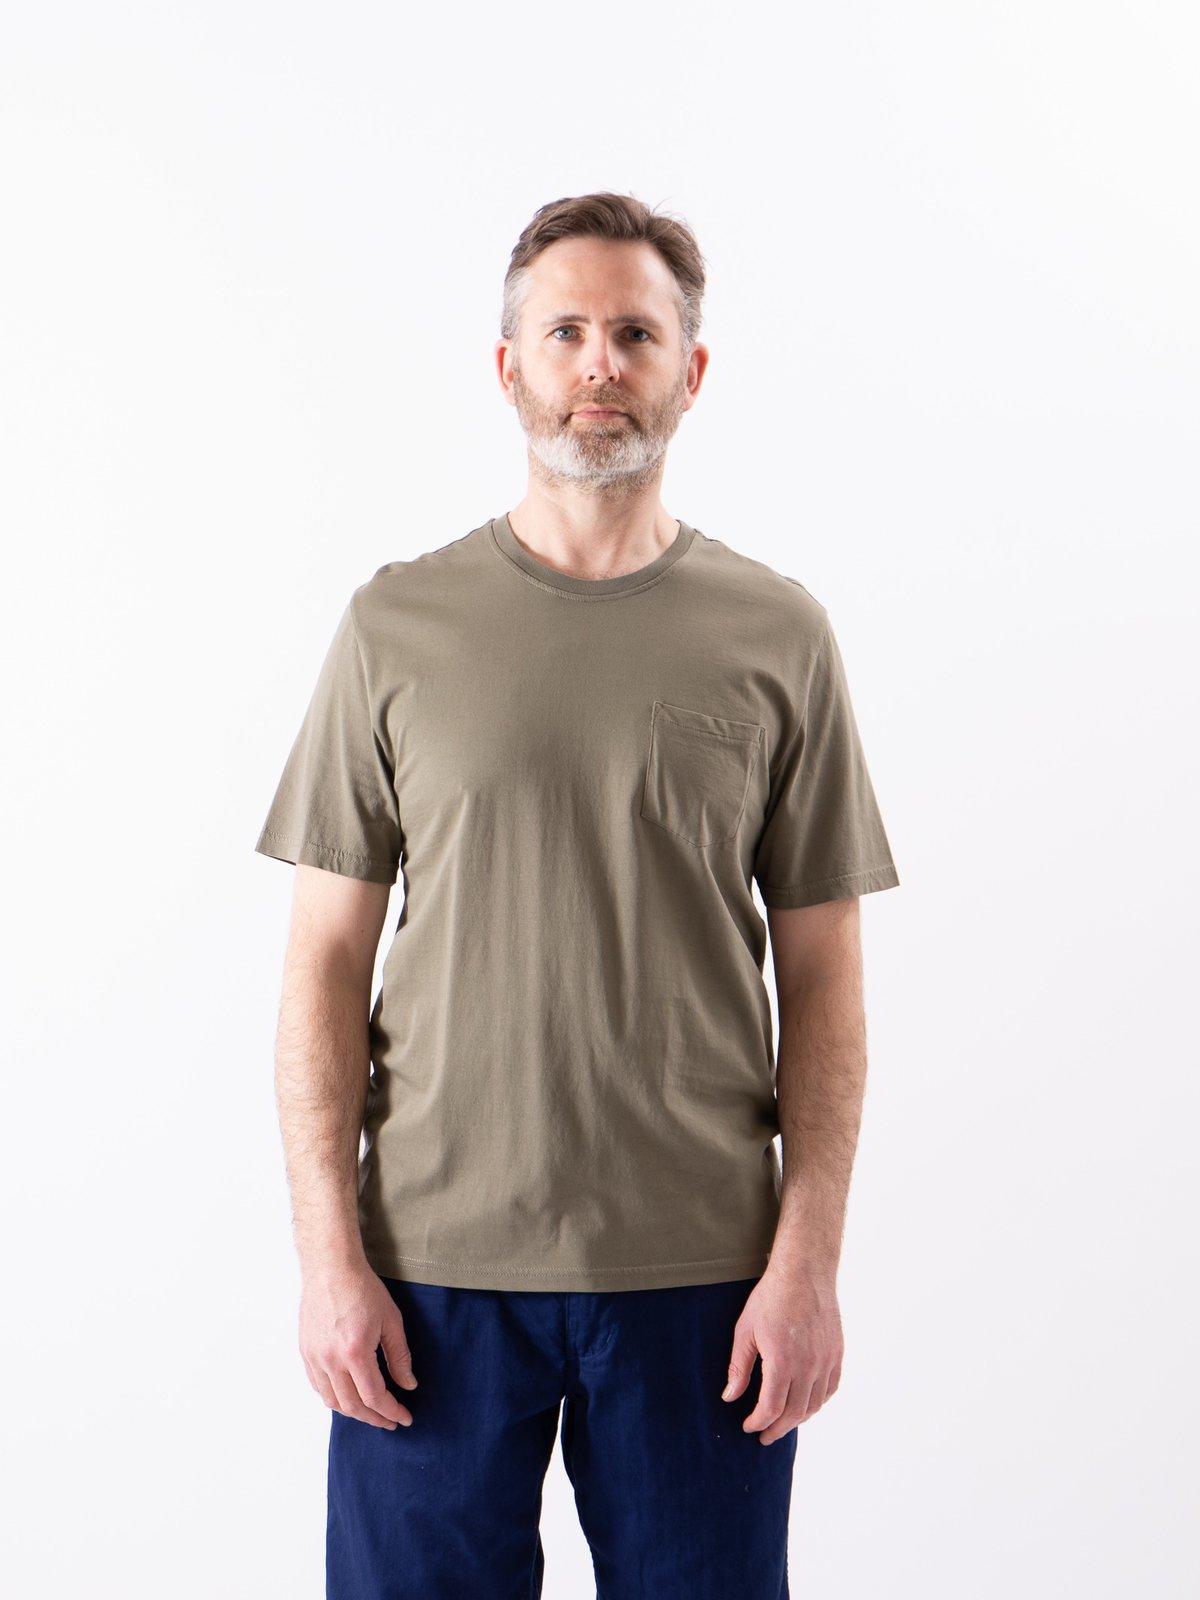 Army Good Basics CTP01 Pocket Crew Neck Tee - Image 2